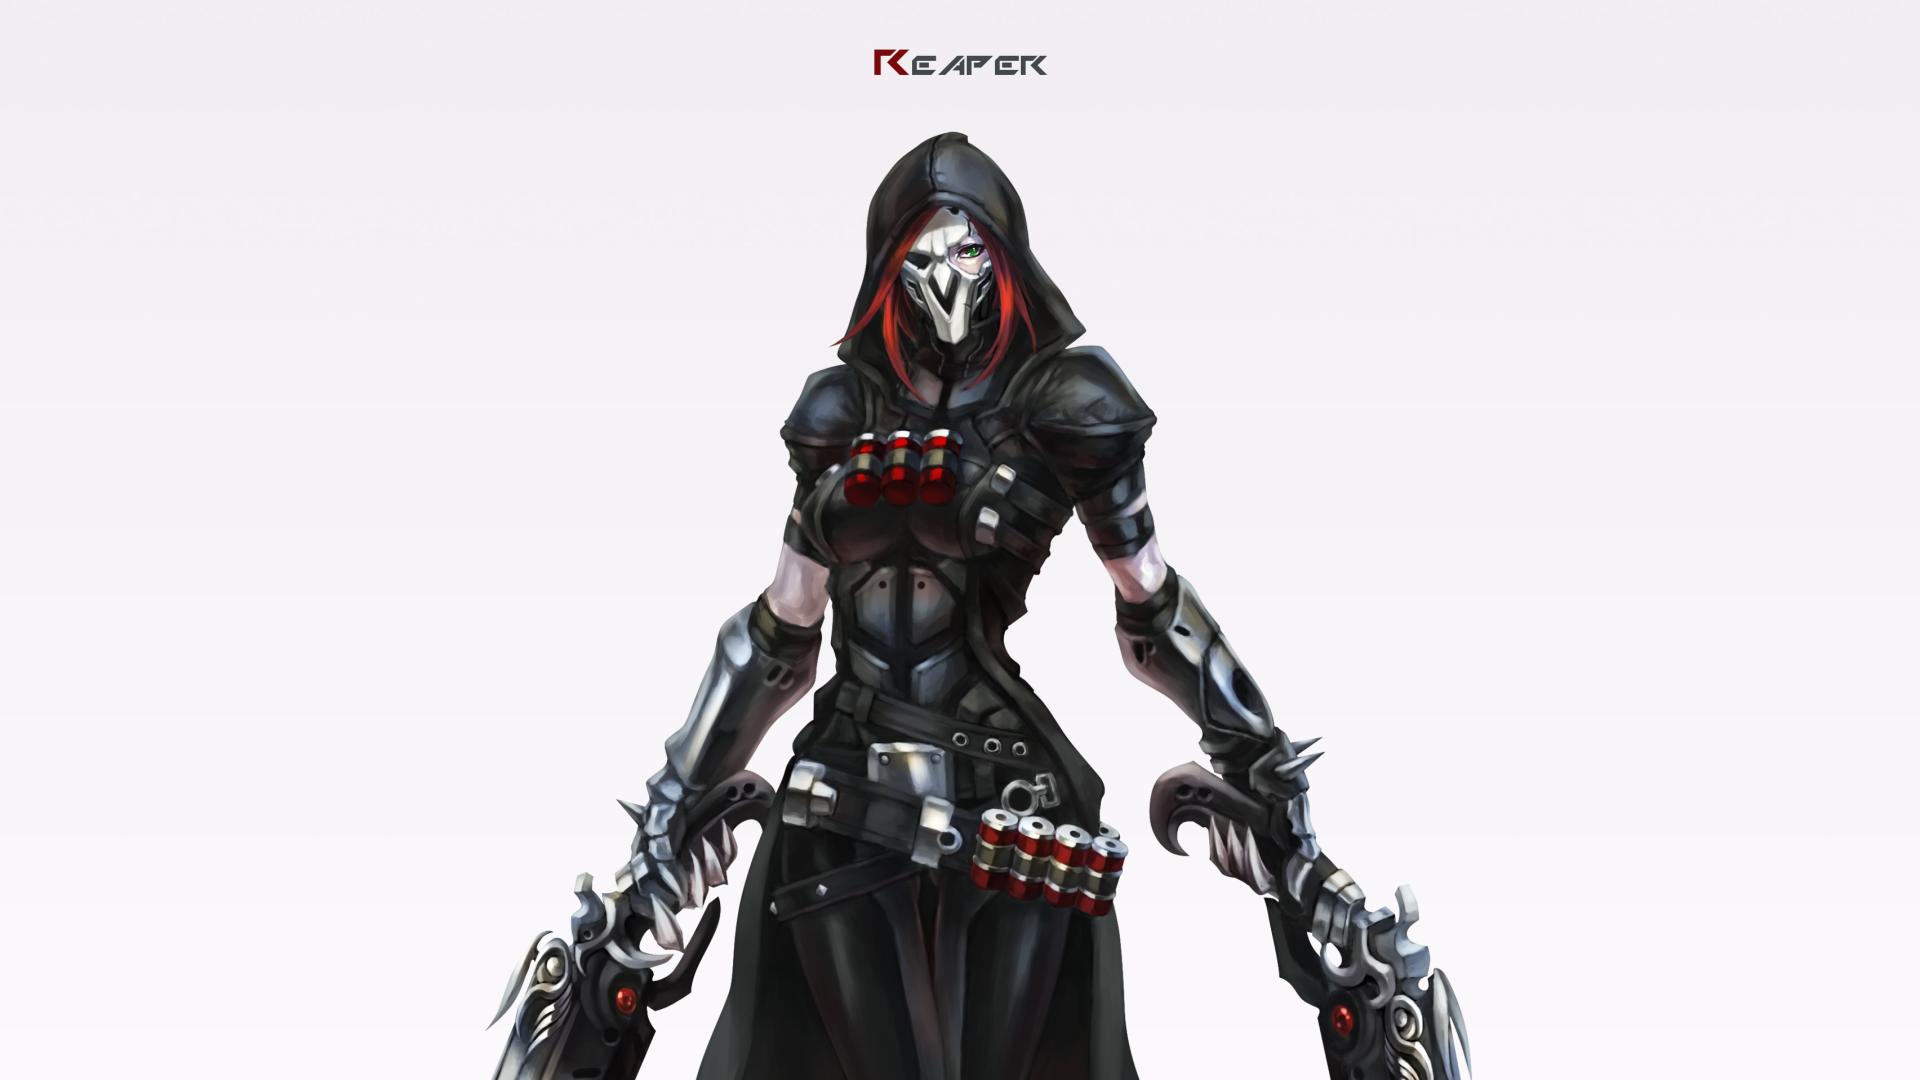 Female Reaper HD Wallpaper | Background Image | 3408x1917 ...